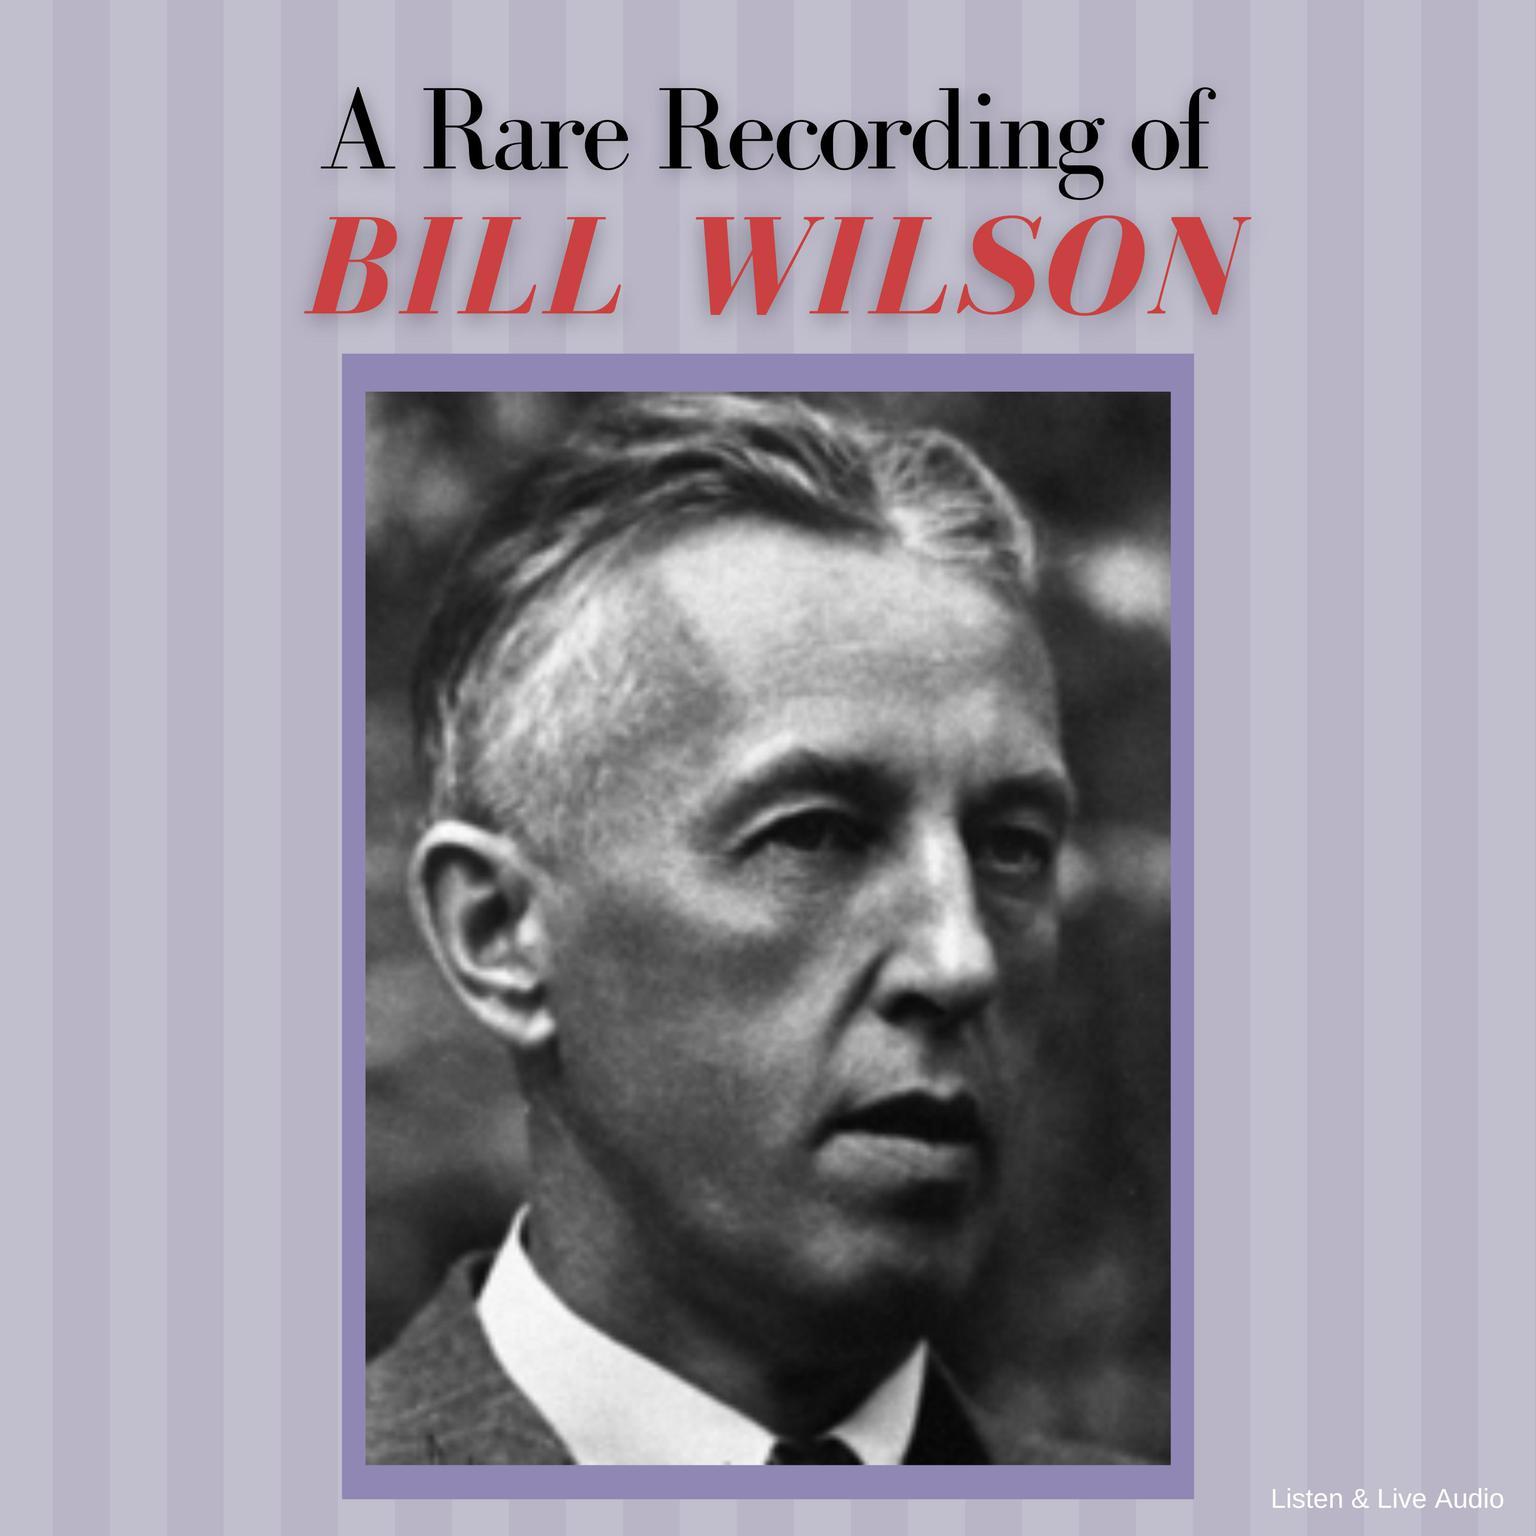 A Rare Recording of Bill Wilson Audiobook, by Bill Wilson